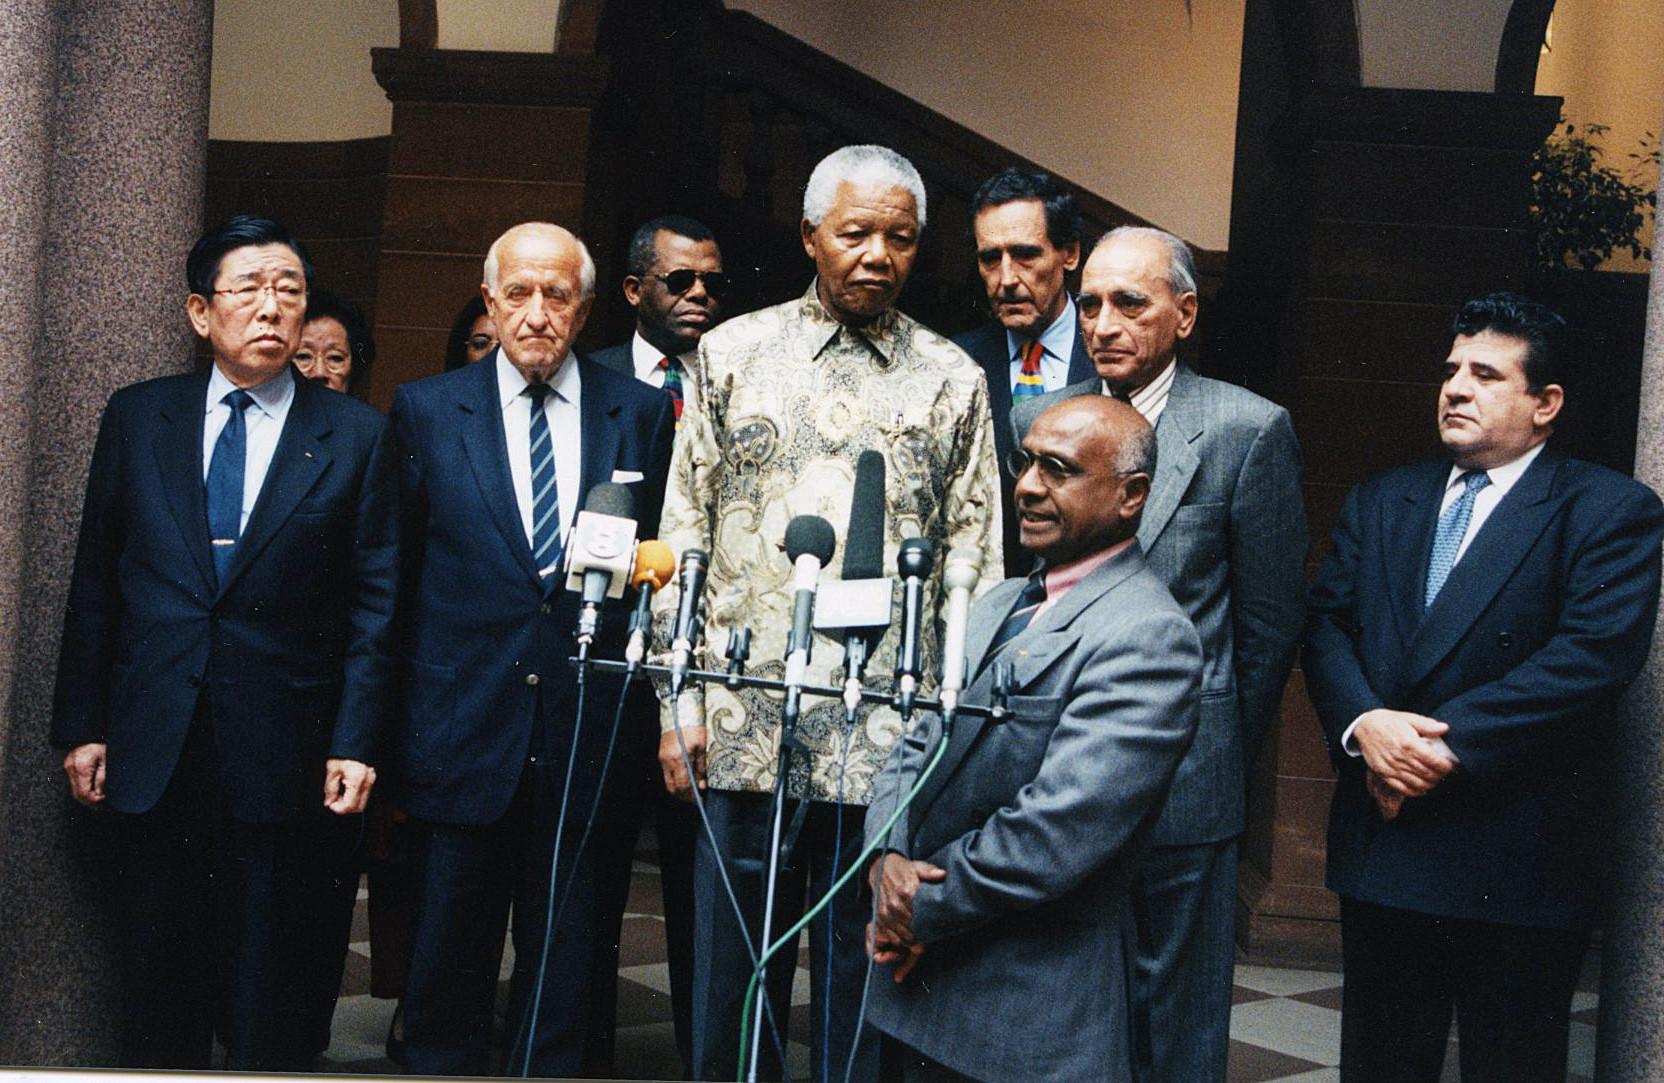 Nelson Mandela with IOC Members including Ramsamy at Mandela's home prior to the 2004 Olympic bid ©Sam Ramsamy